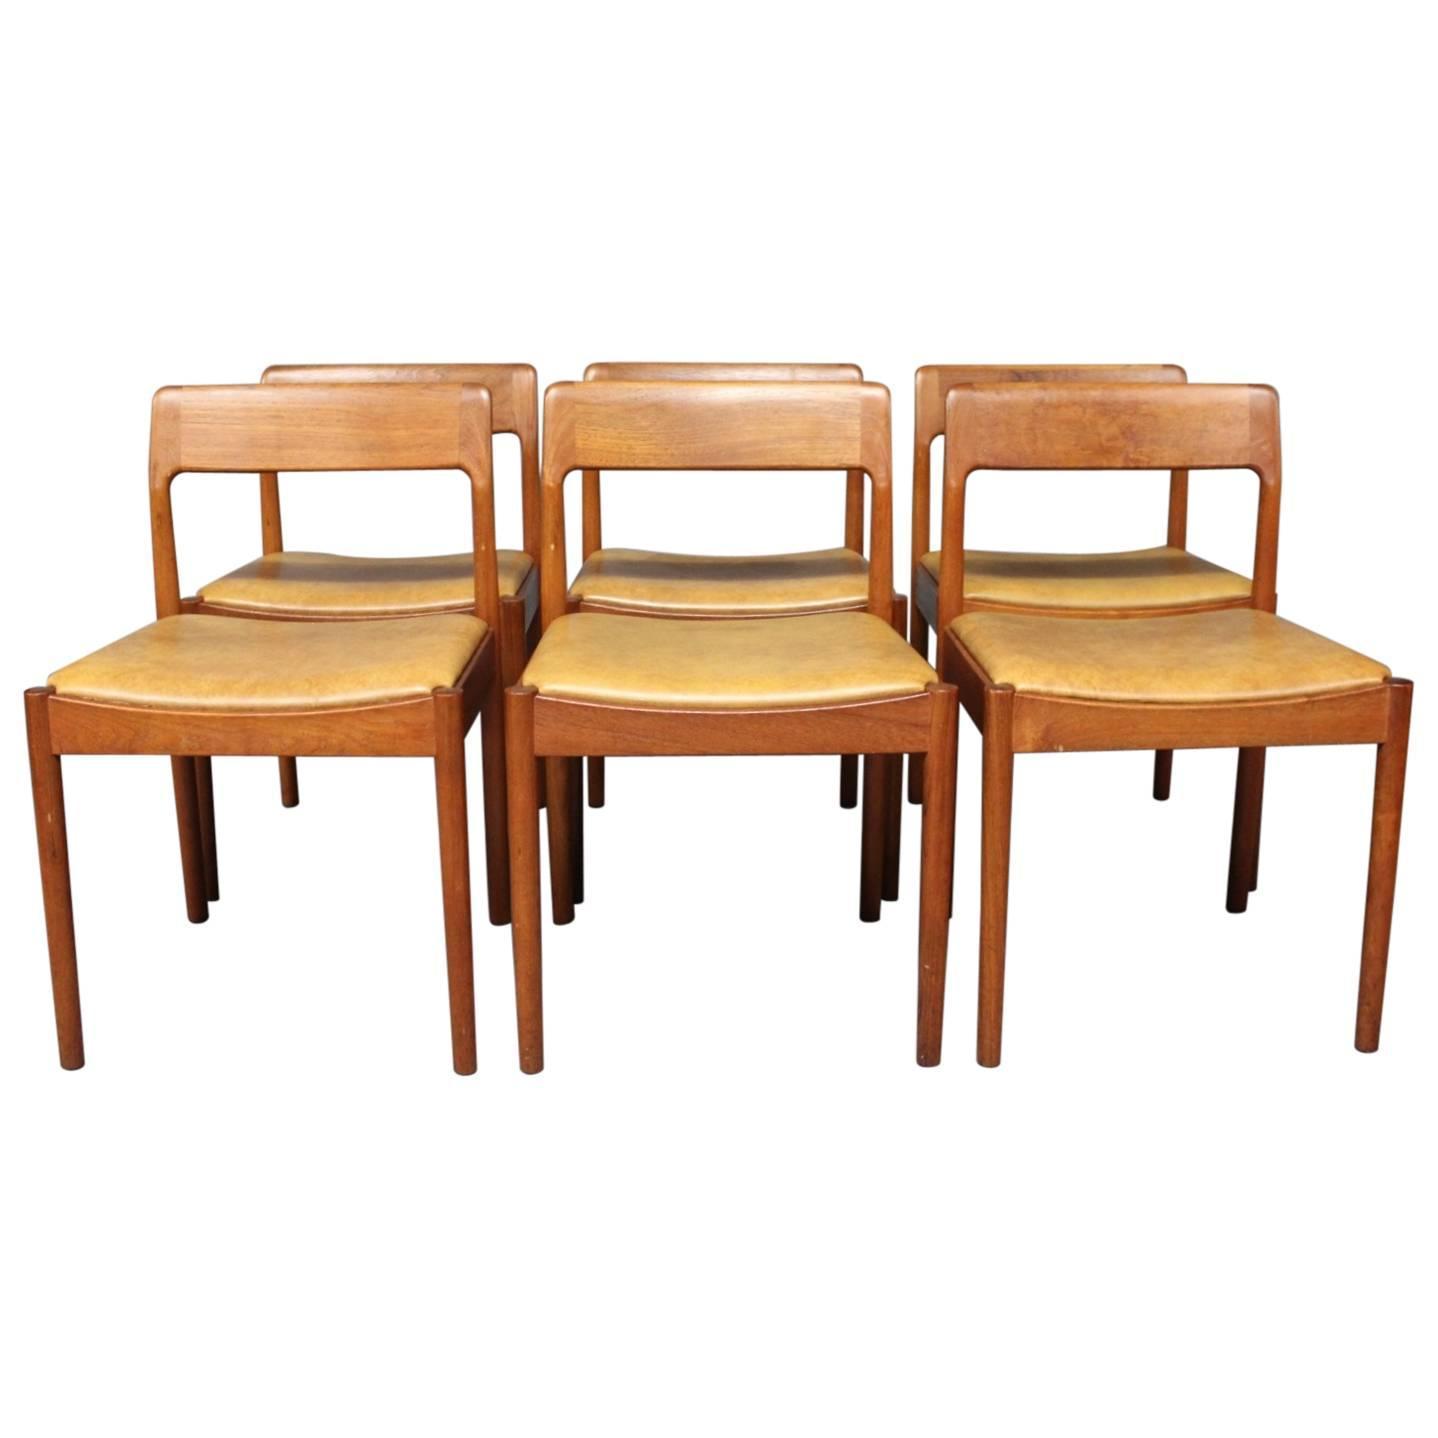 teak chairs dining room photo - 1